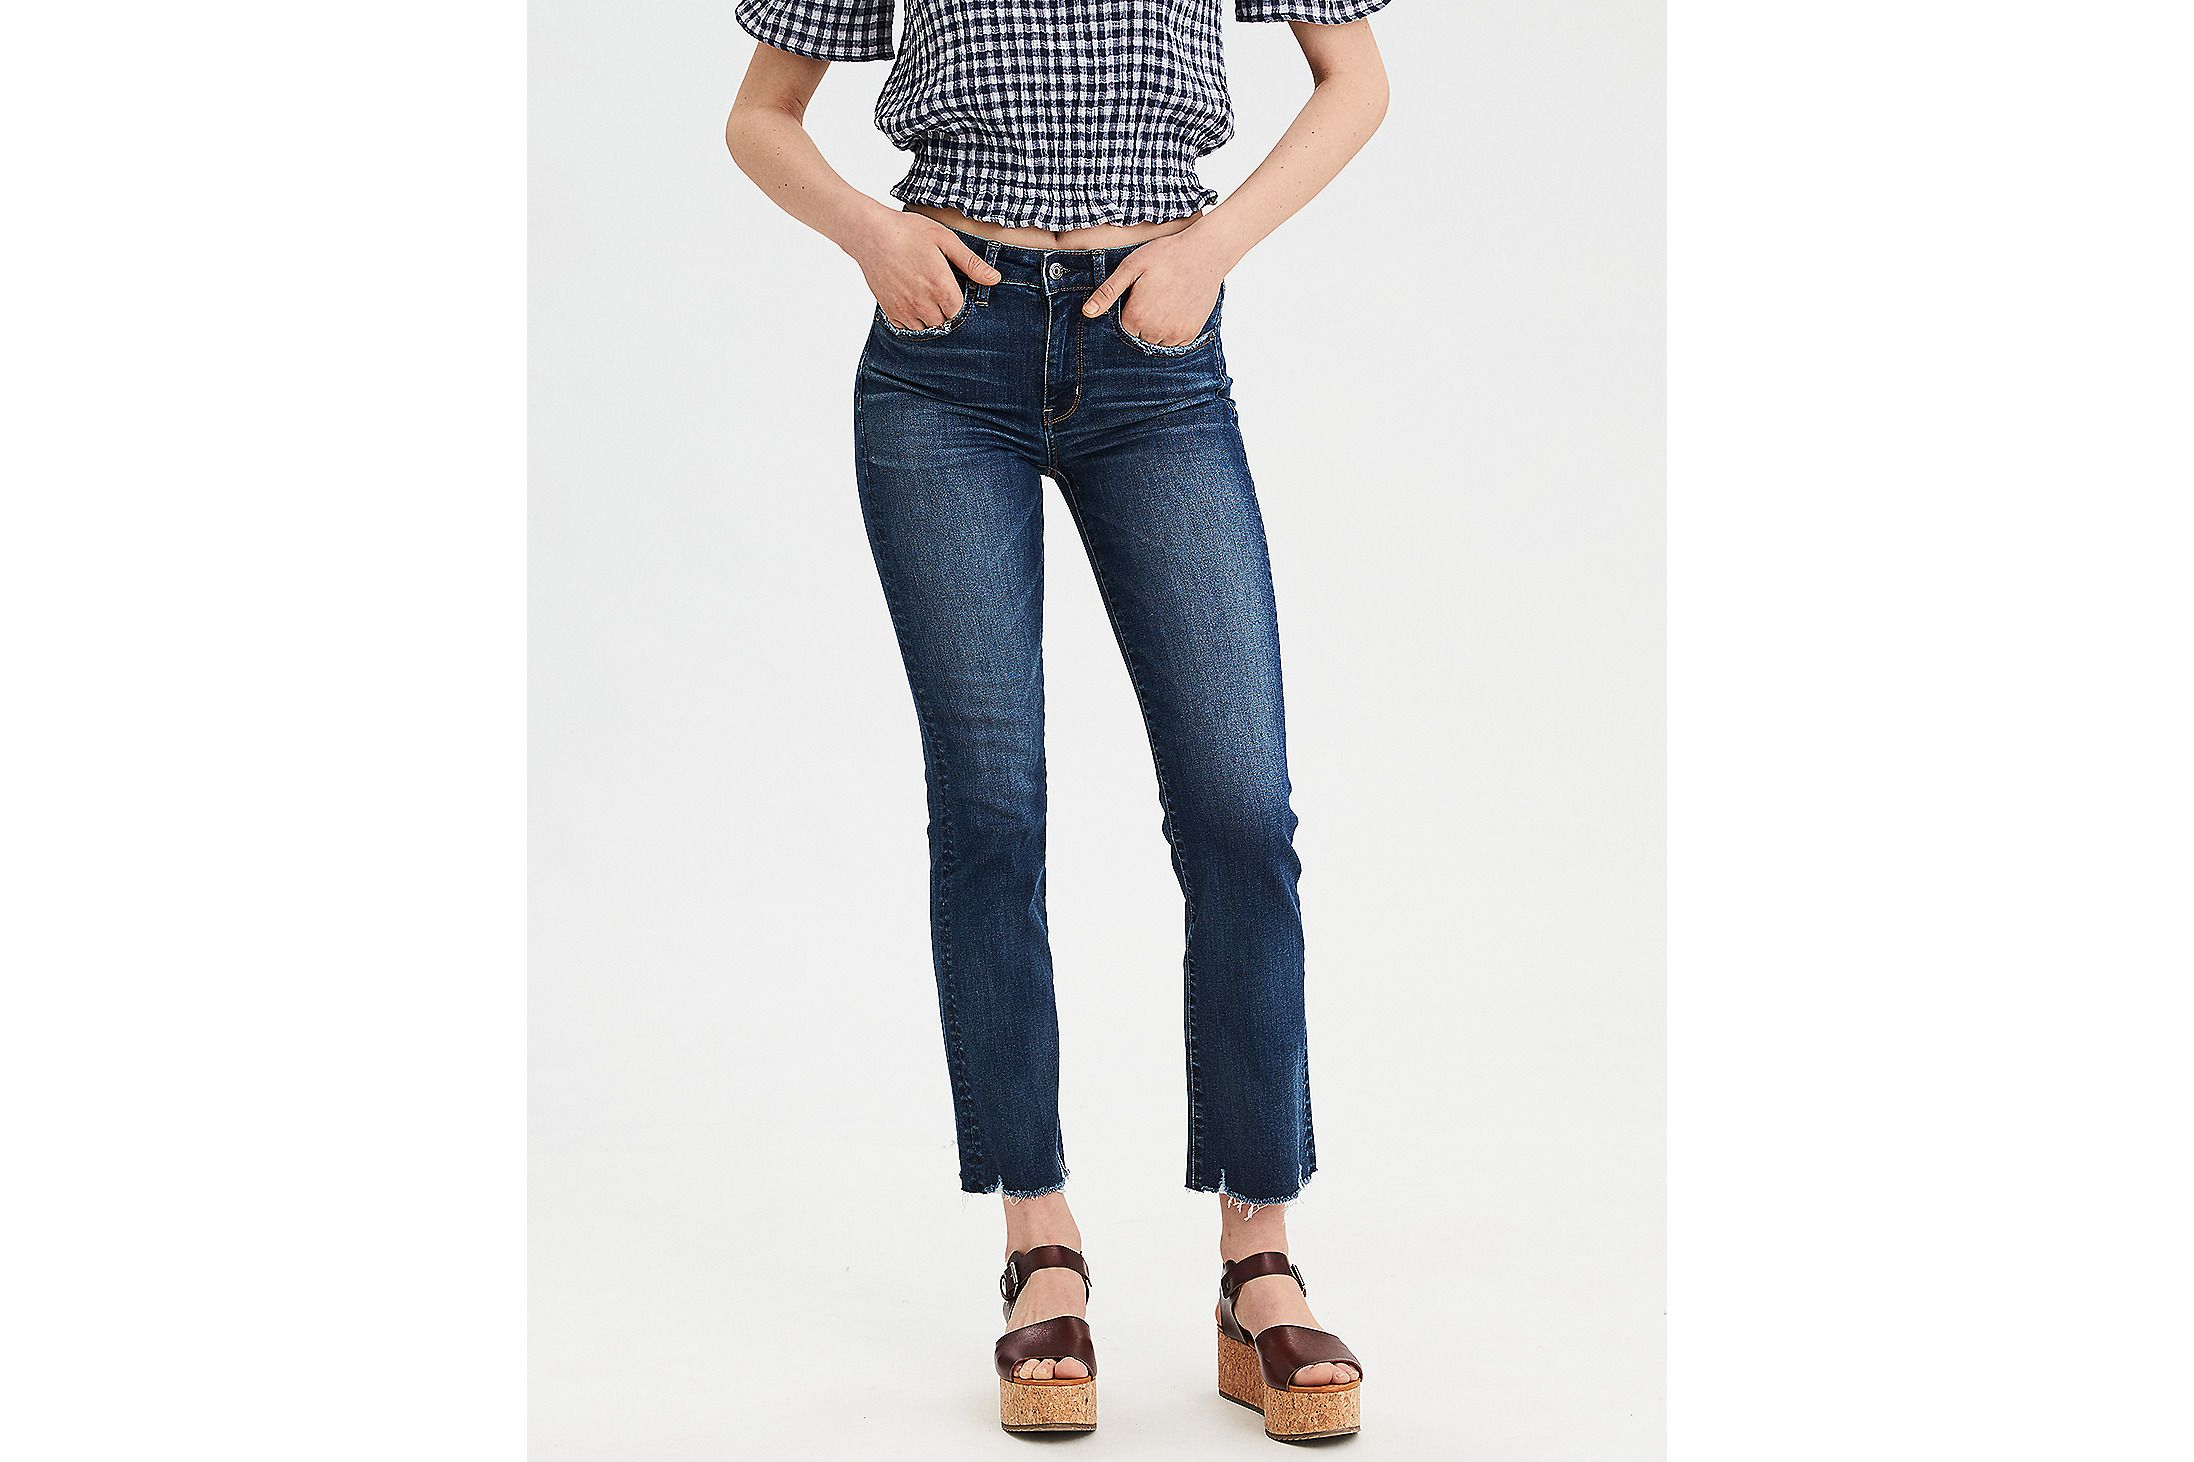 c811e55d5e Ne(X)t Level High-Waisted Crop Flare Jean